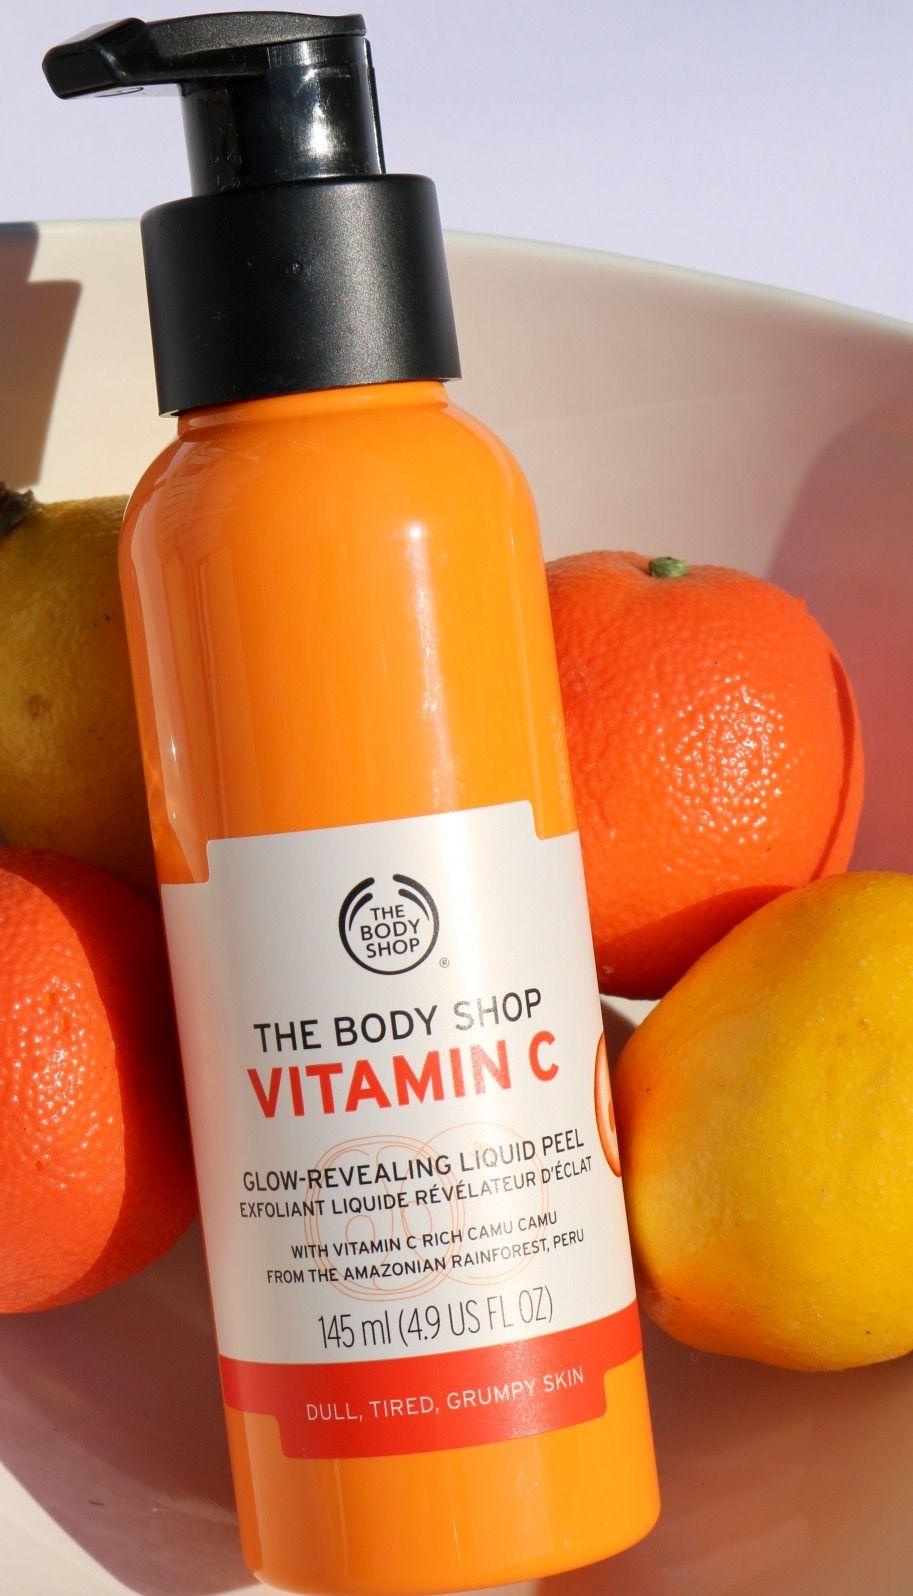 The Body Shop Vitamin C Glow Revealing Liquid Peel www